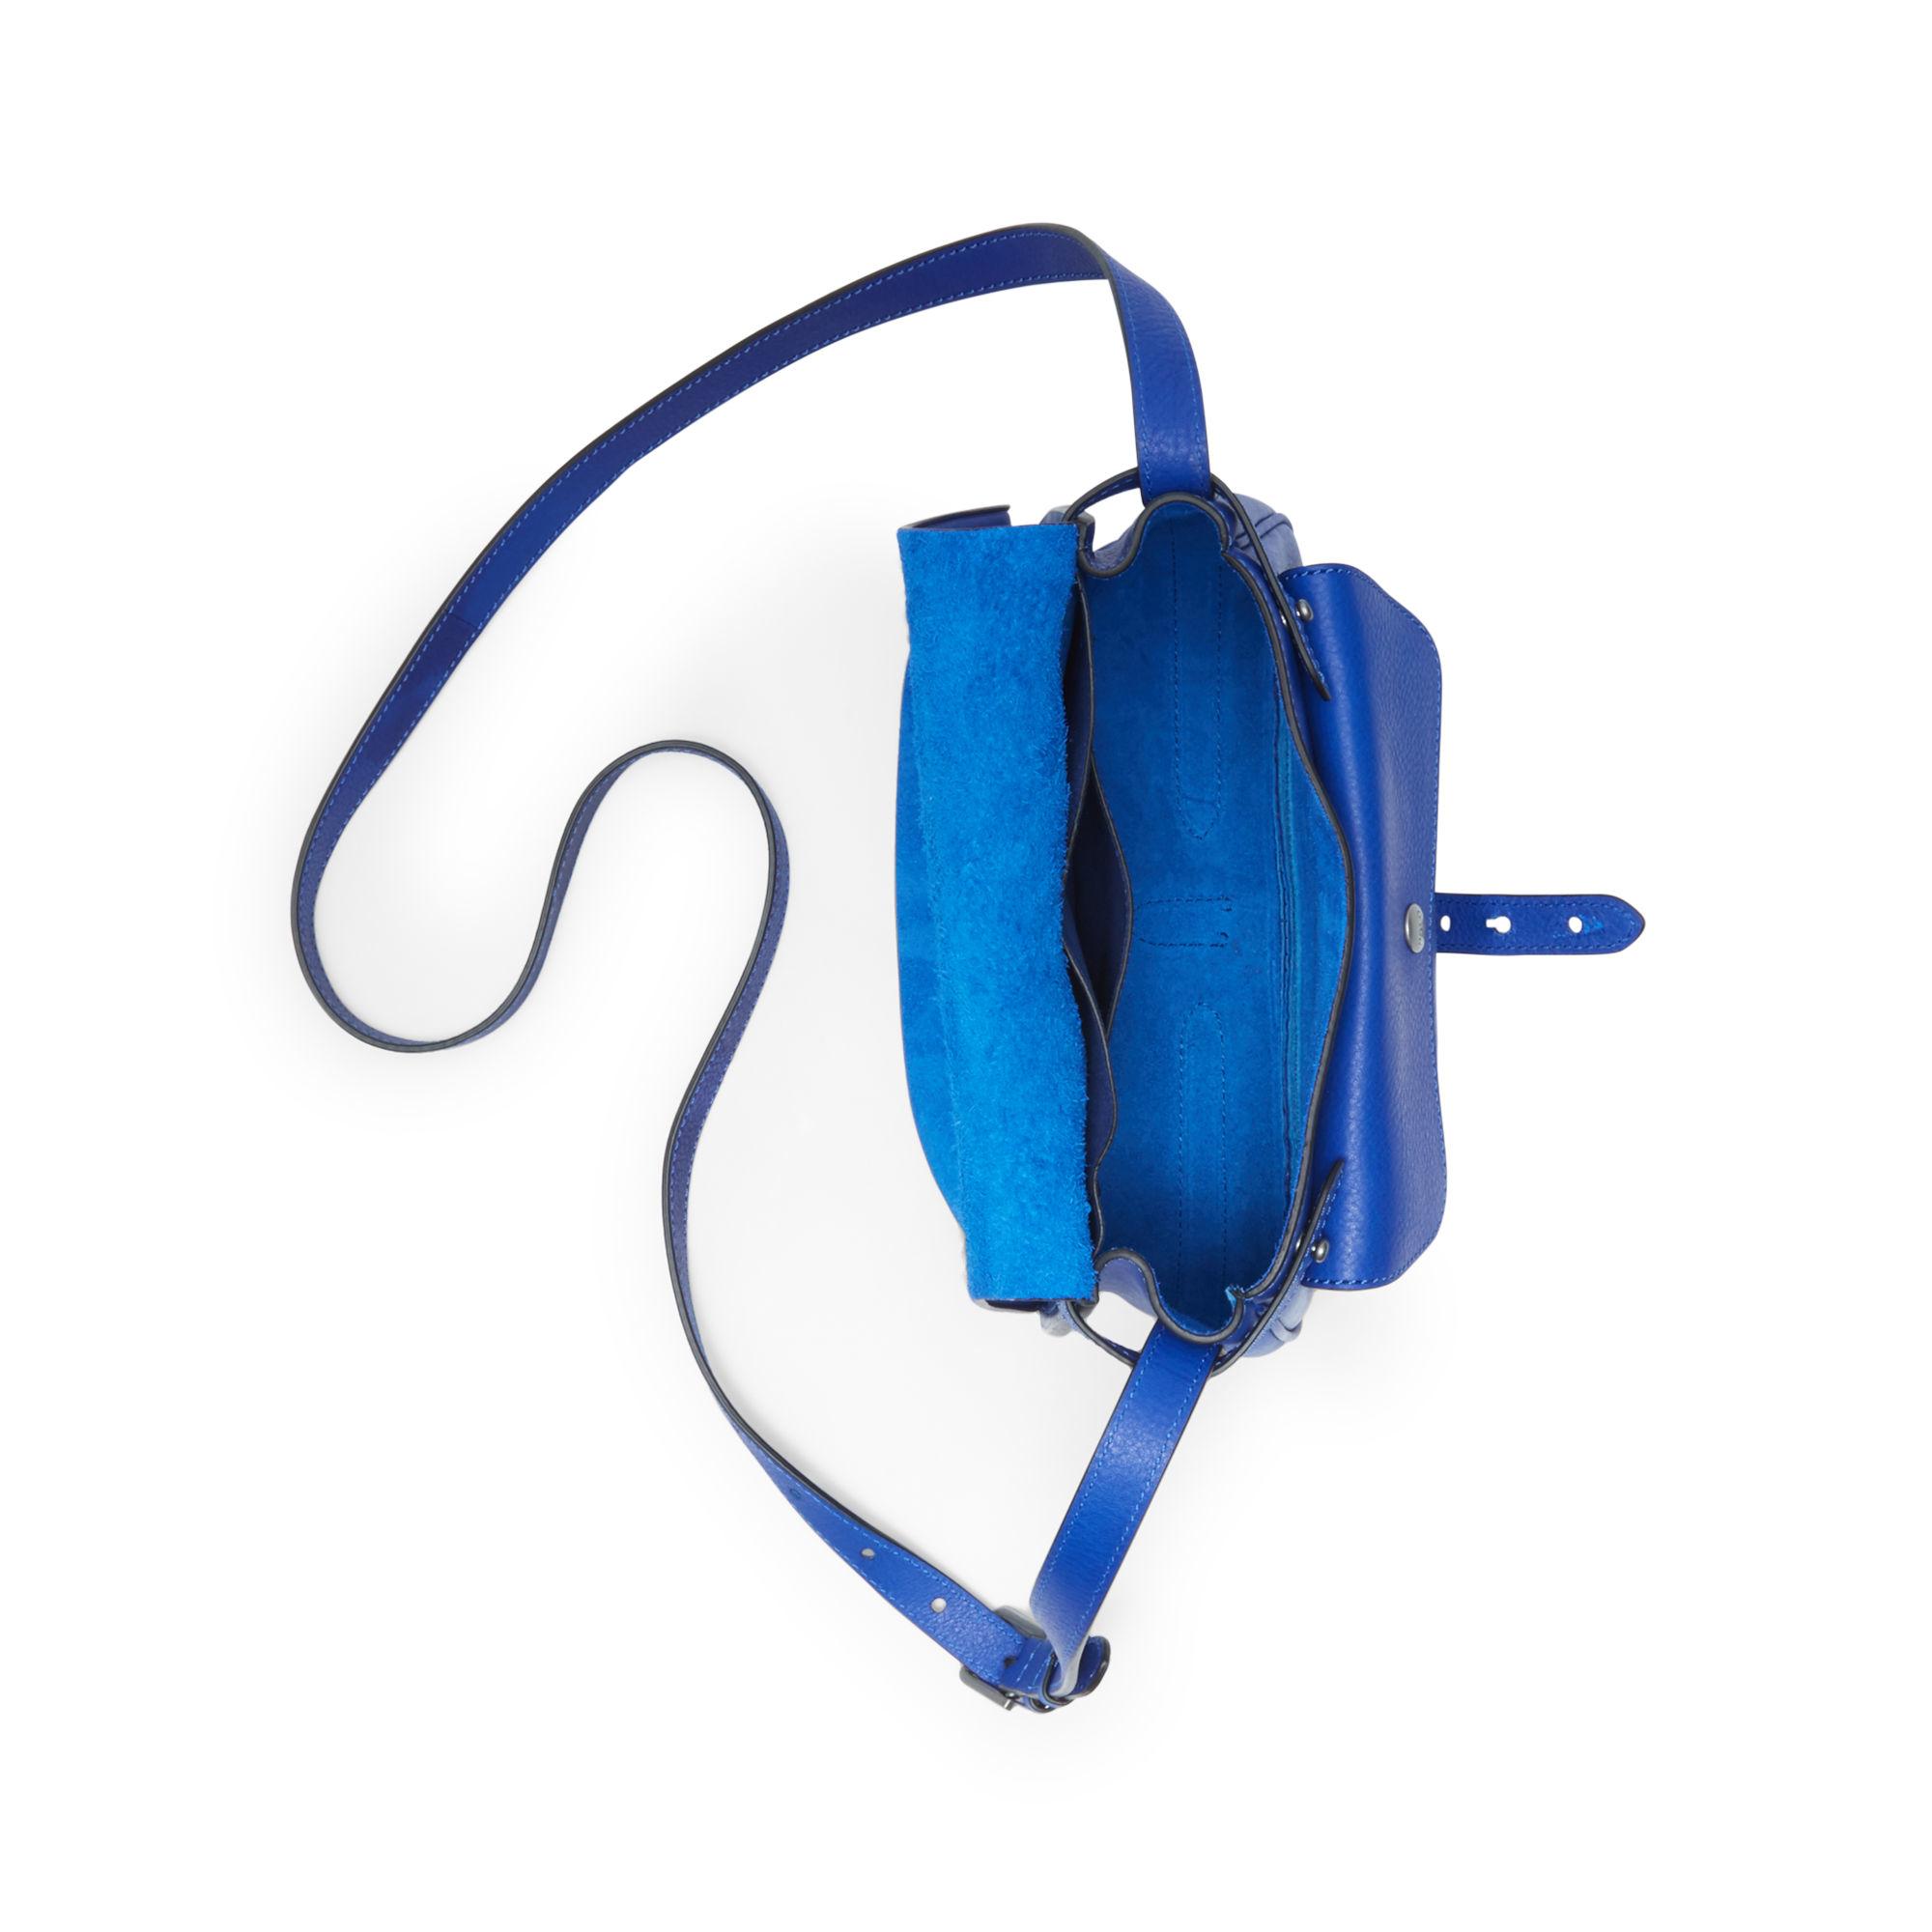 f4d7db0ddb0f Polo Ralph Lauren Medium Vachetta Cross-body Bag in Blue - Lyst